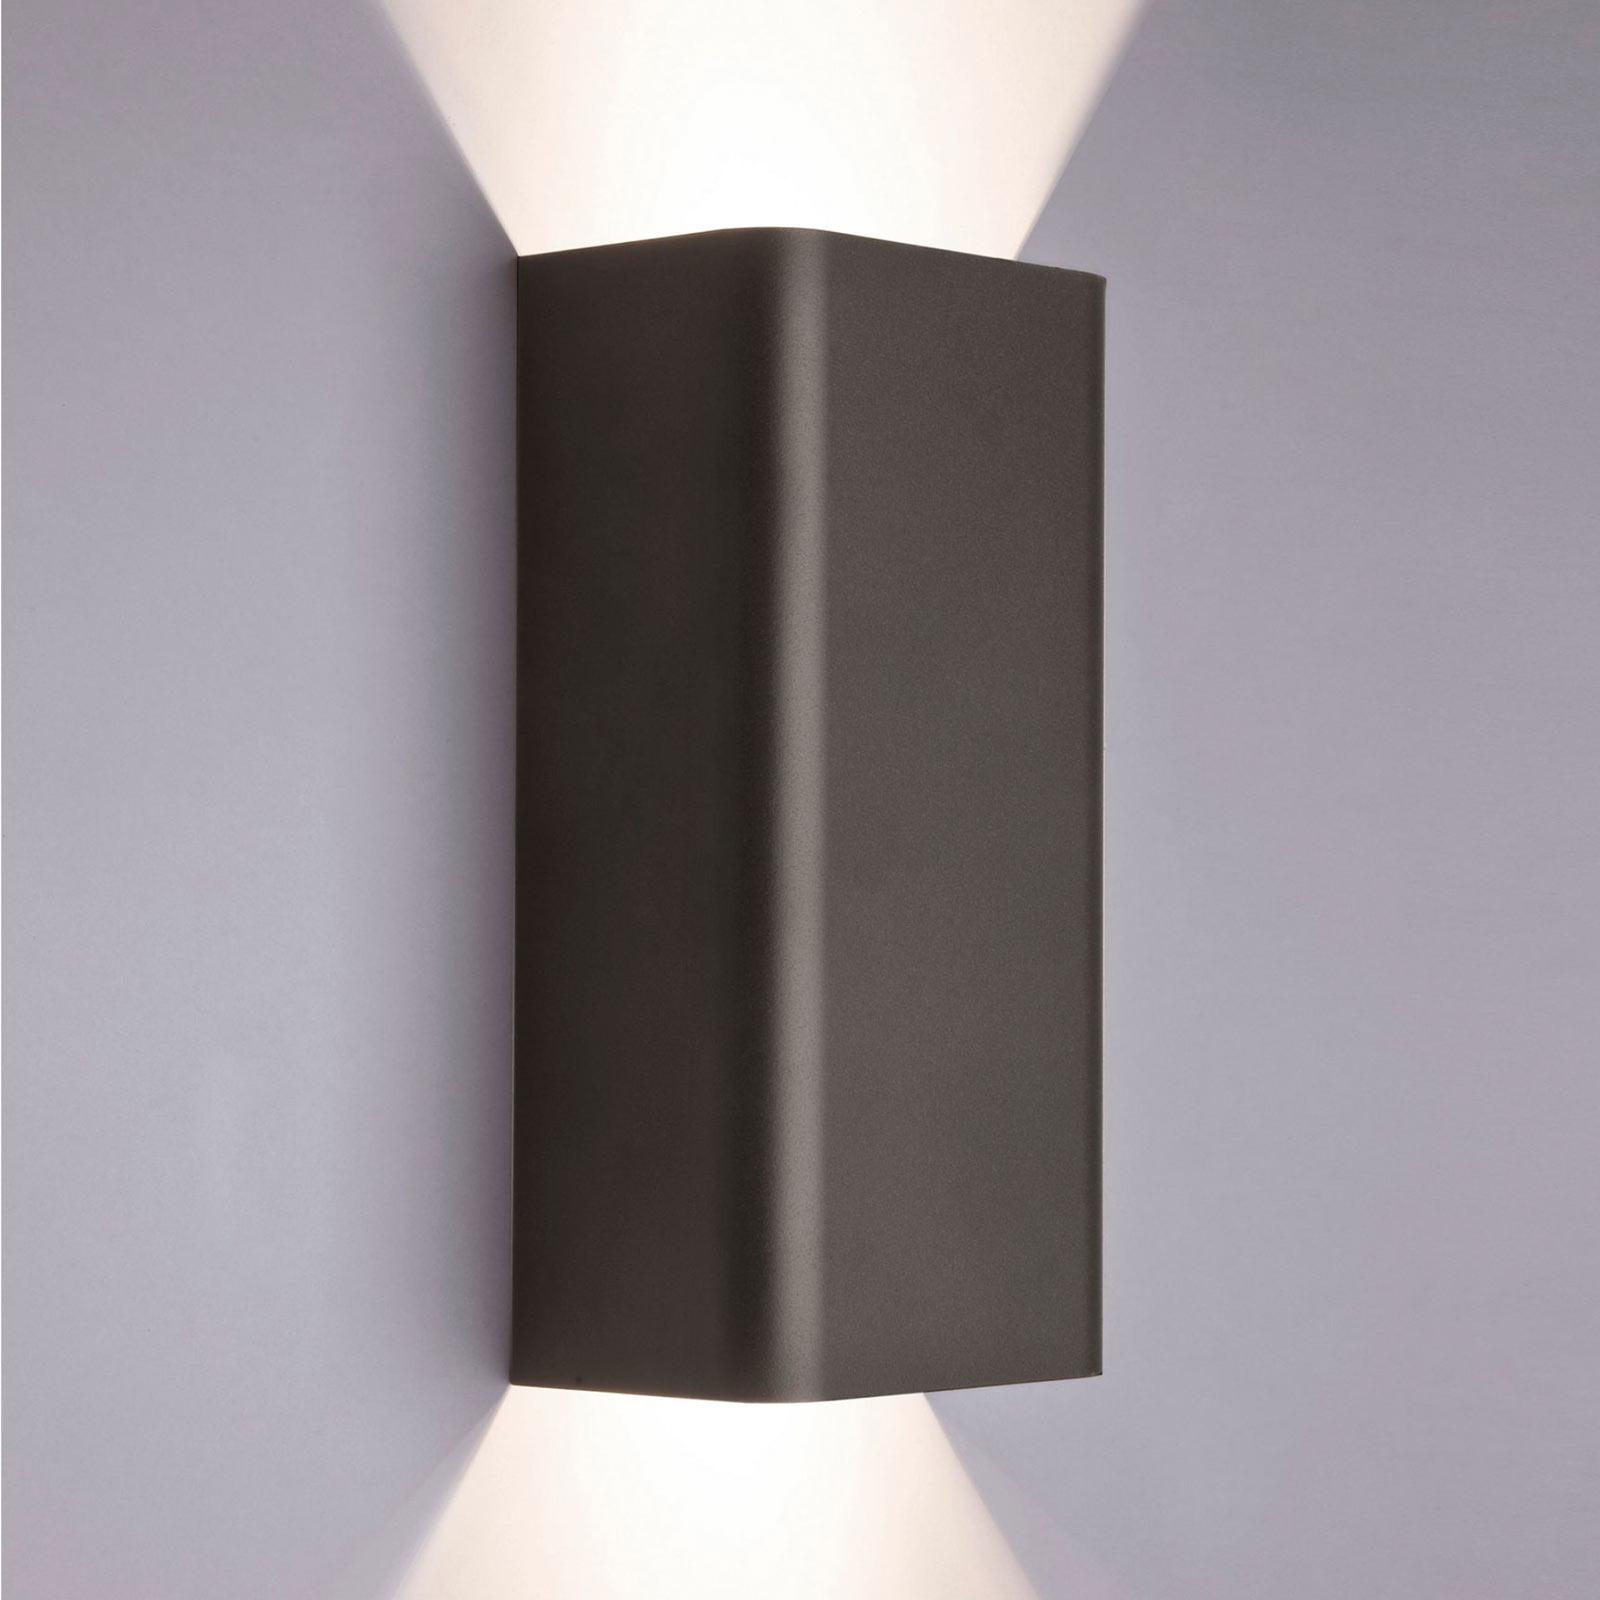 Wandlampe Bergen up & down, graphit